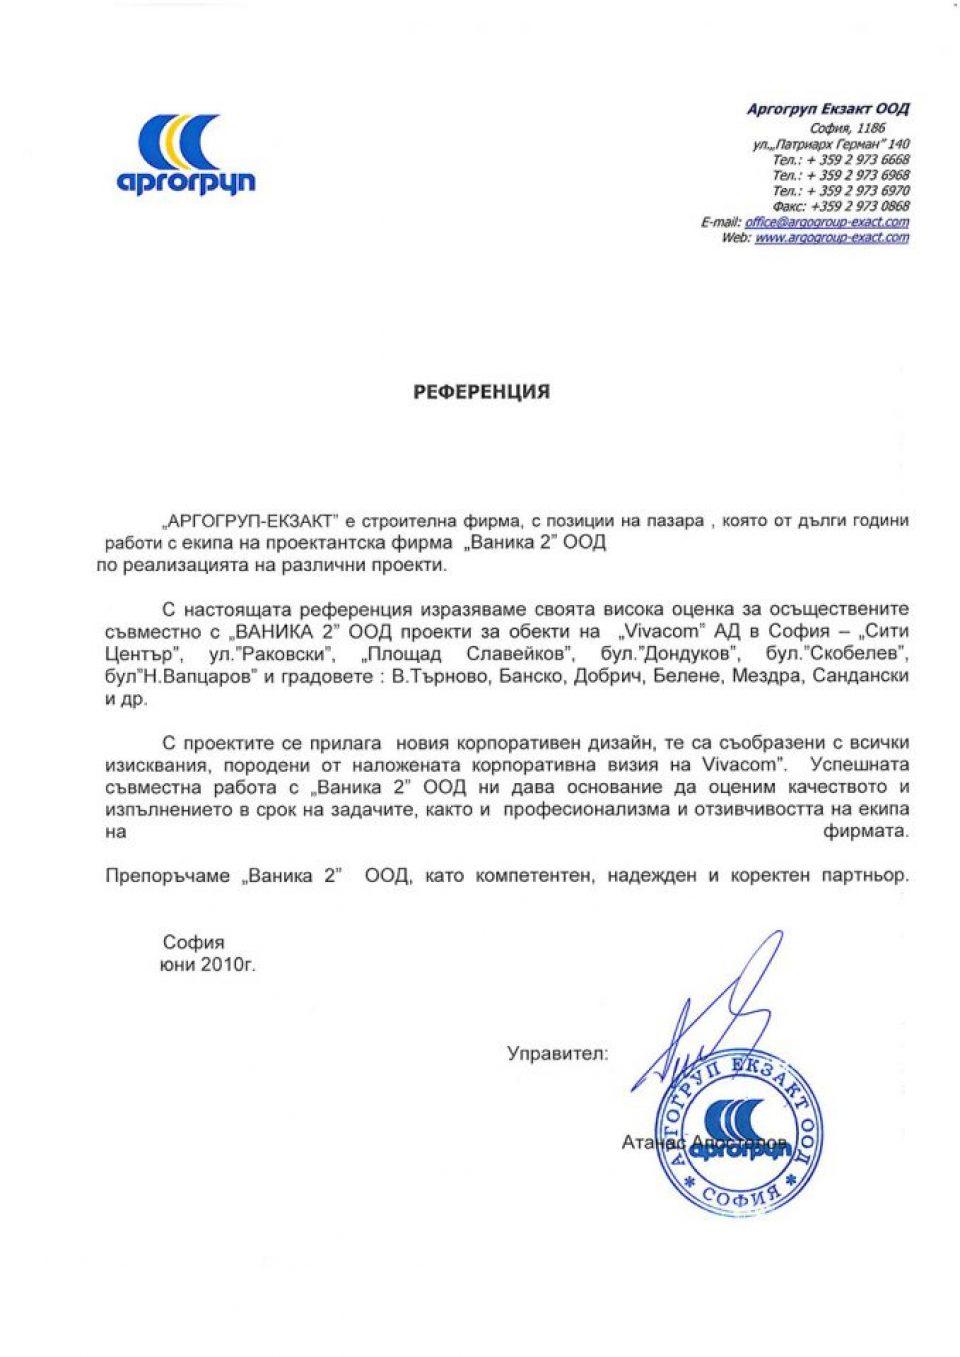 Аргогруп Eкзакт ООД